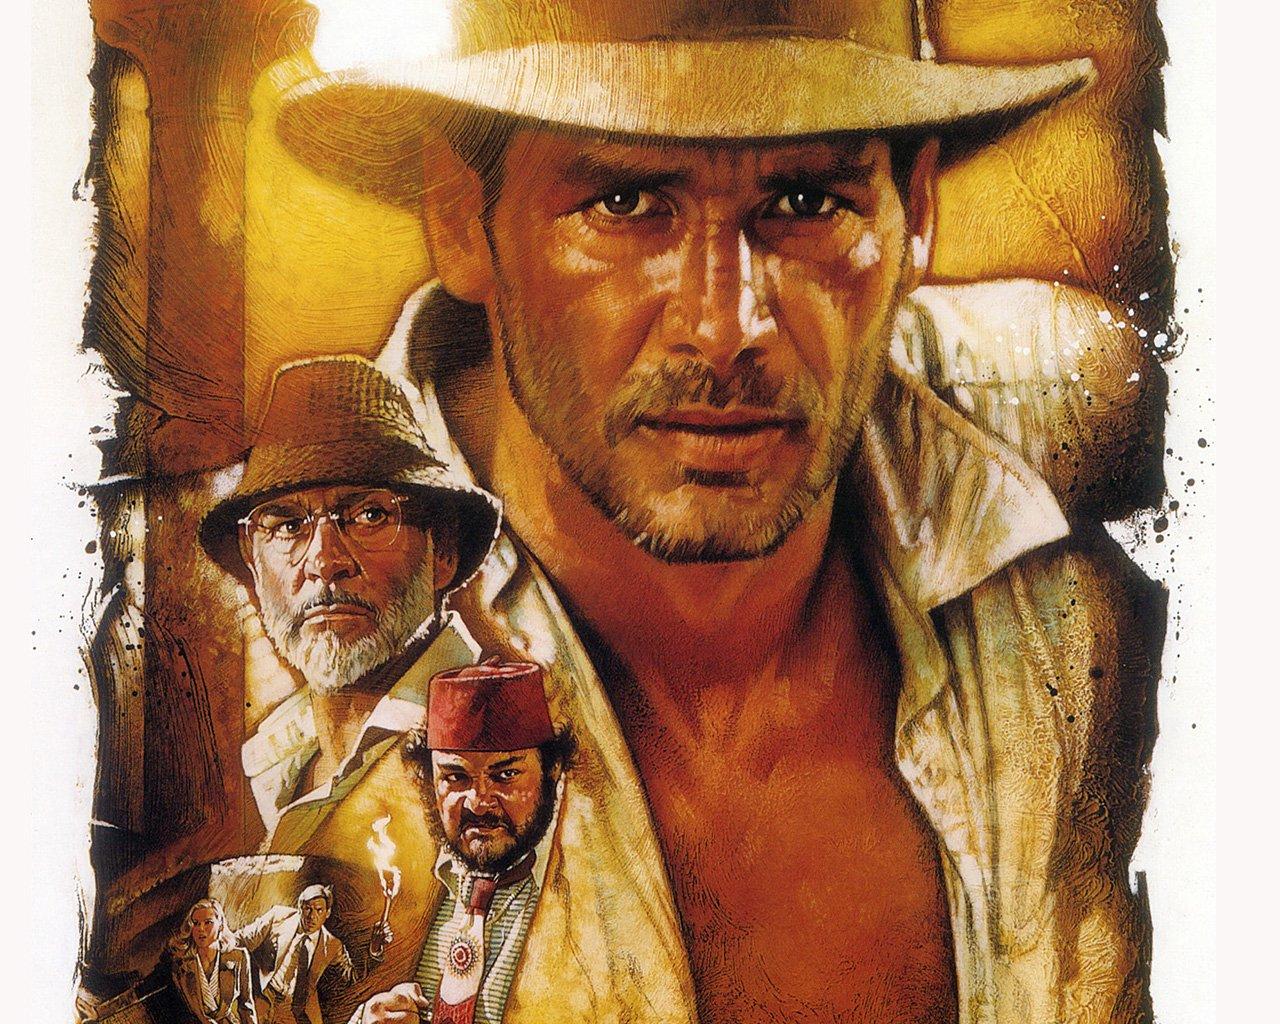 Images Indiana Jones Indiana Jones and the Last Crusade film Movies